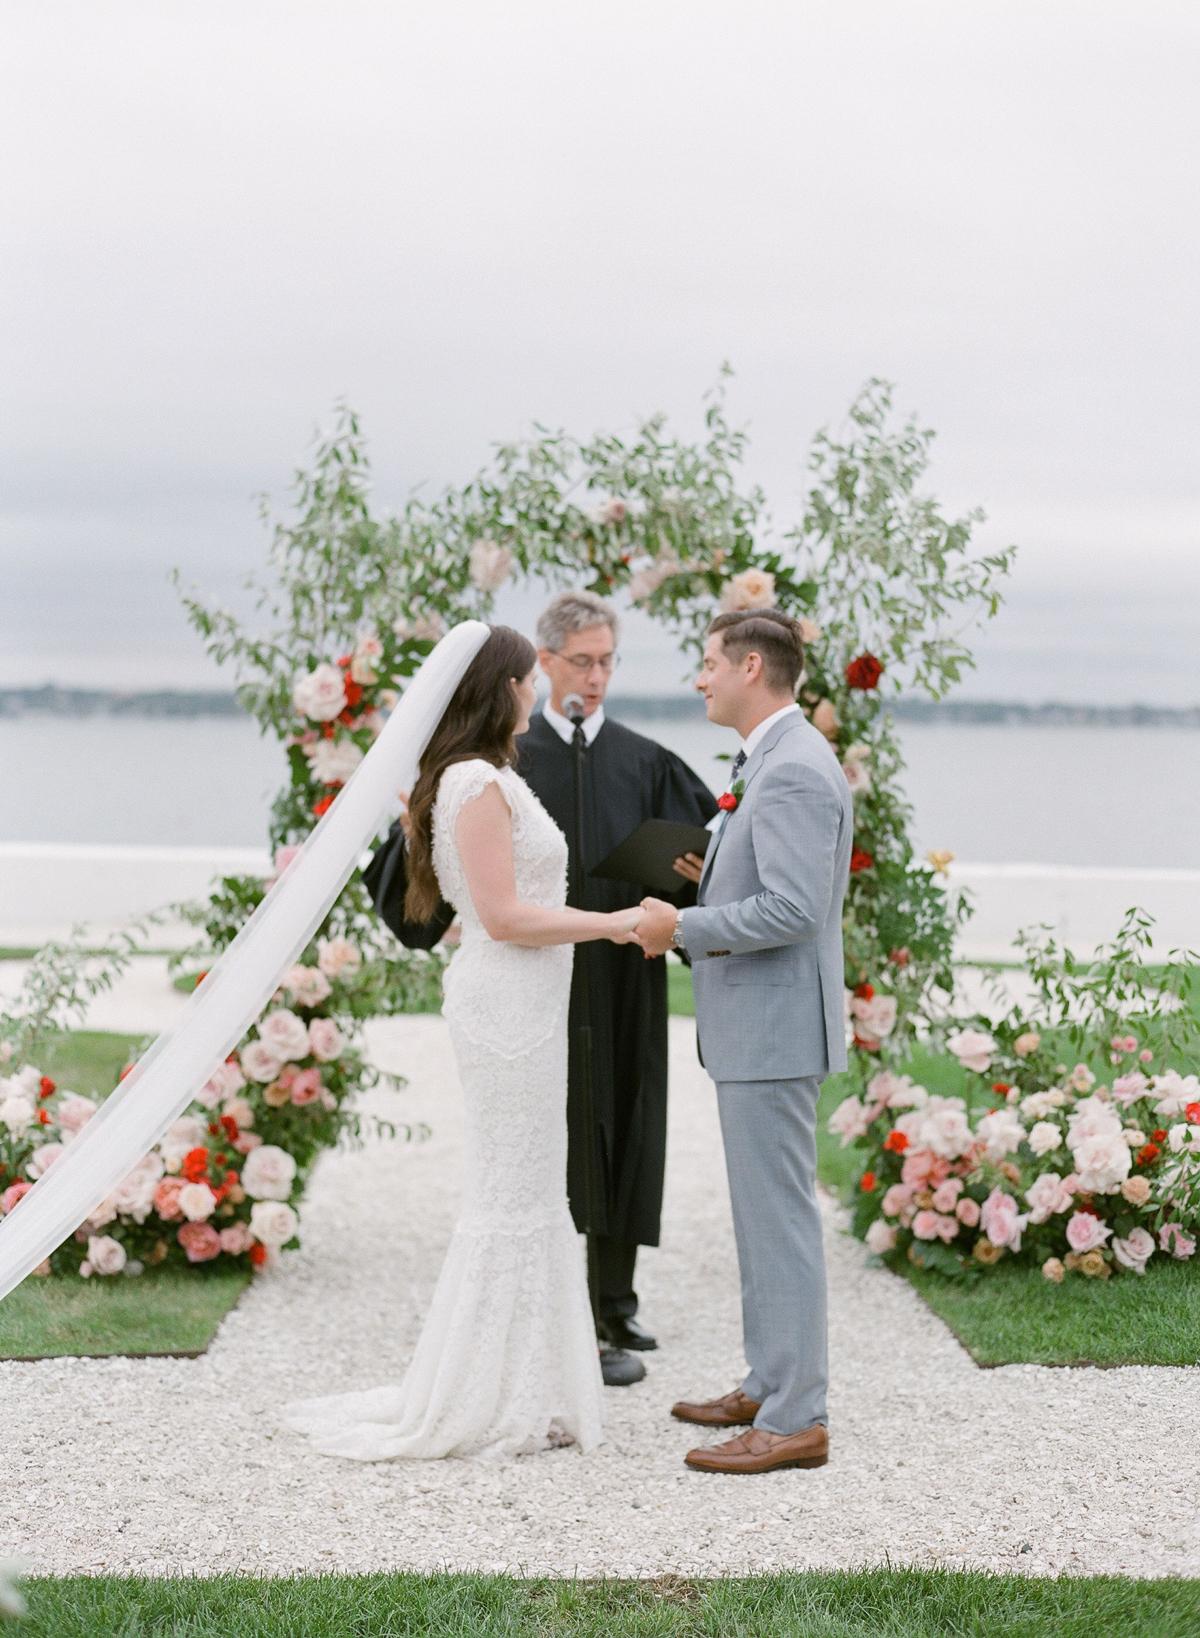 colleen stephen newport wedding ceremony couple holding hands